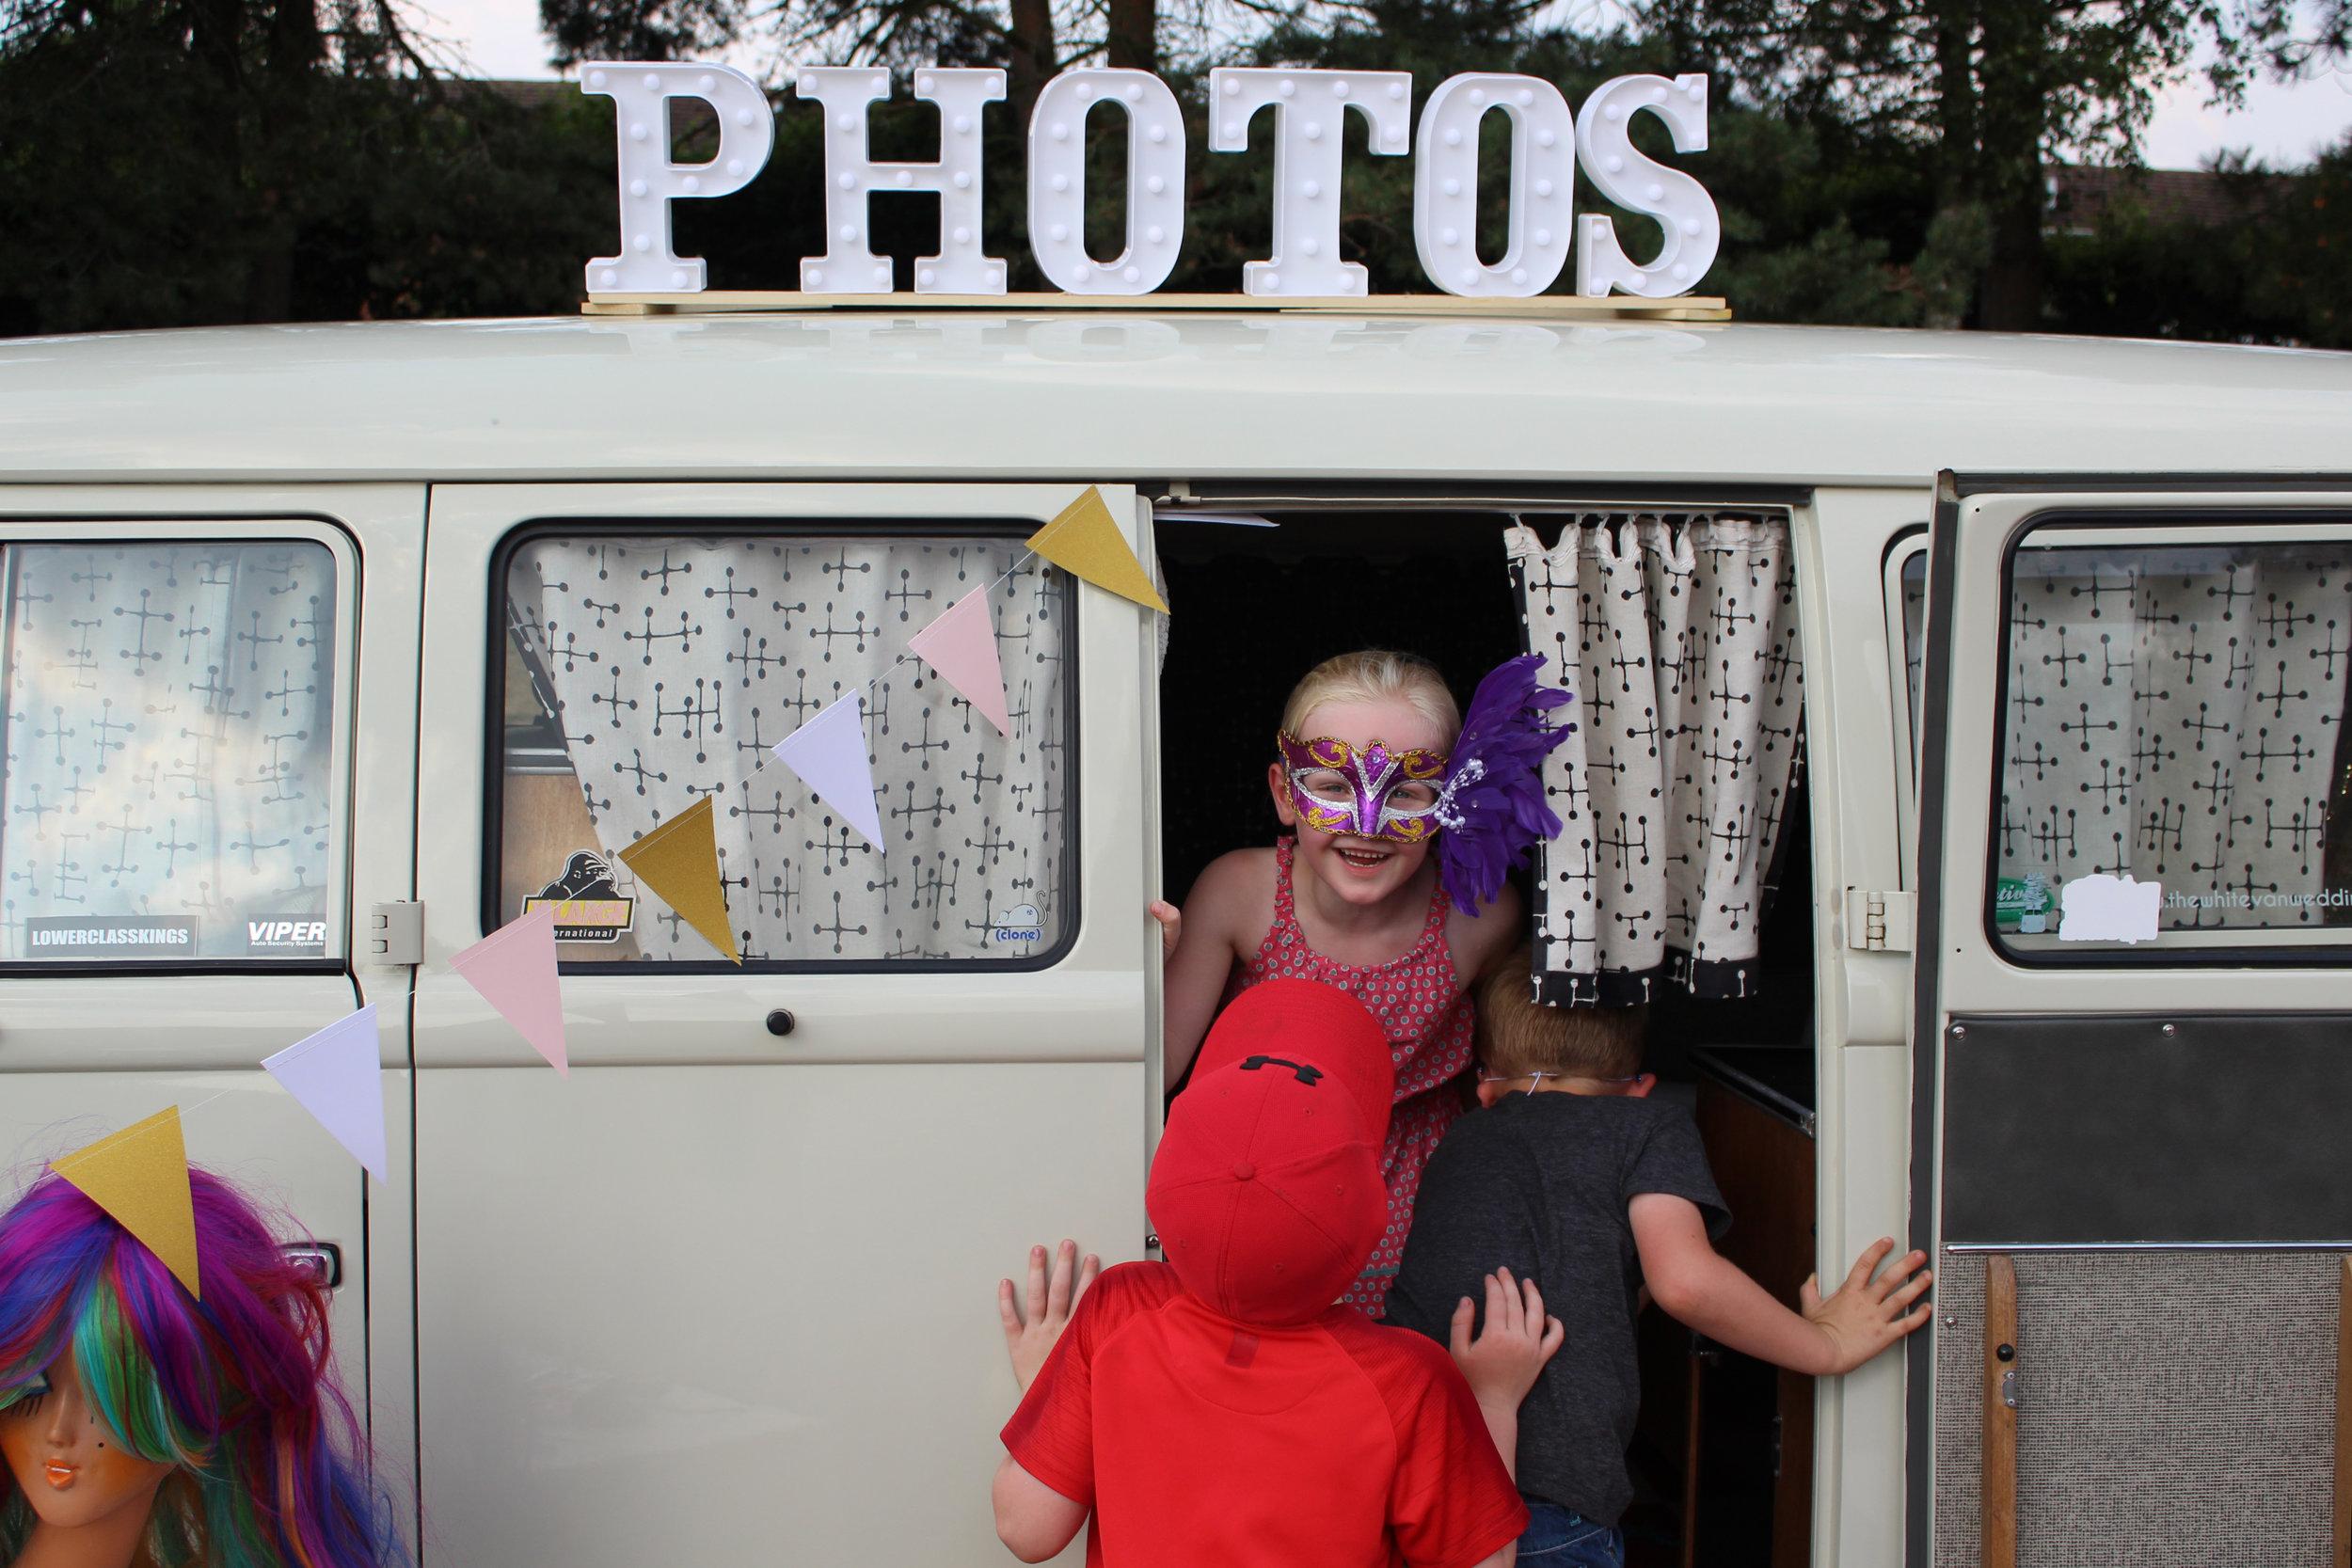 photo-booth-dartford.jpg